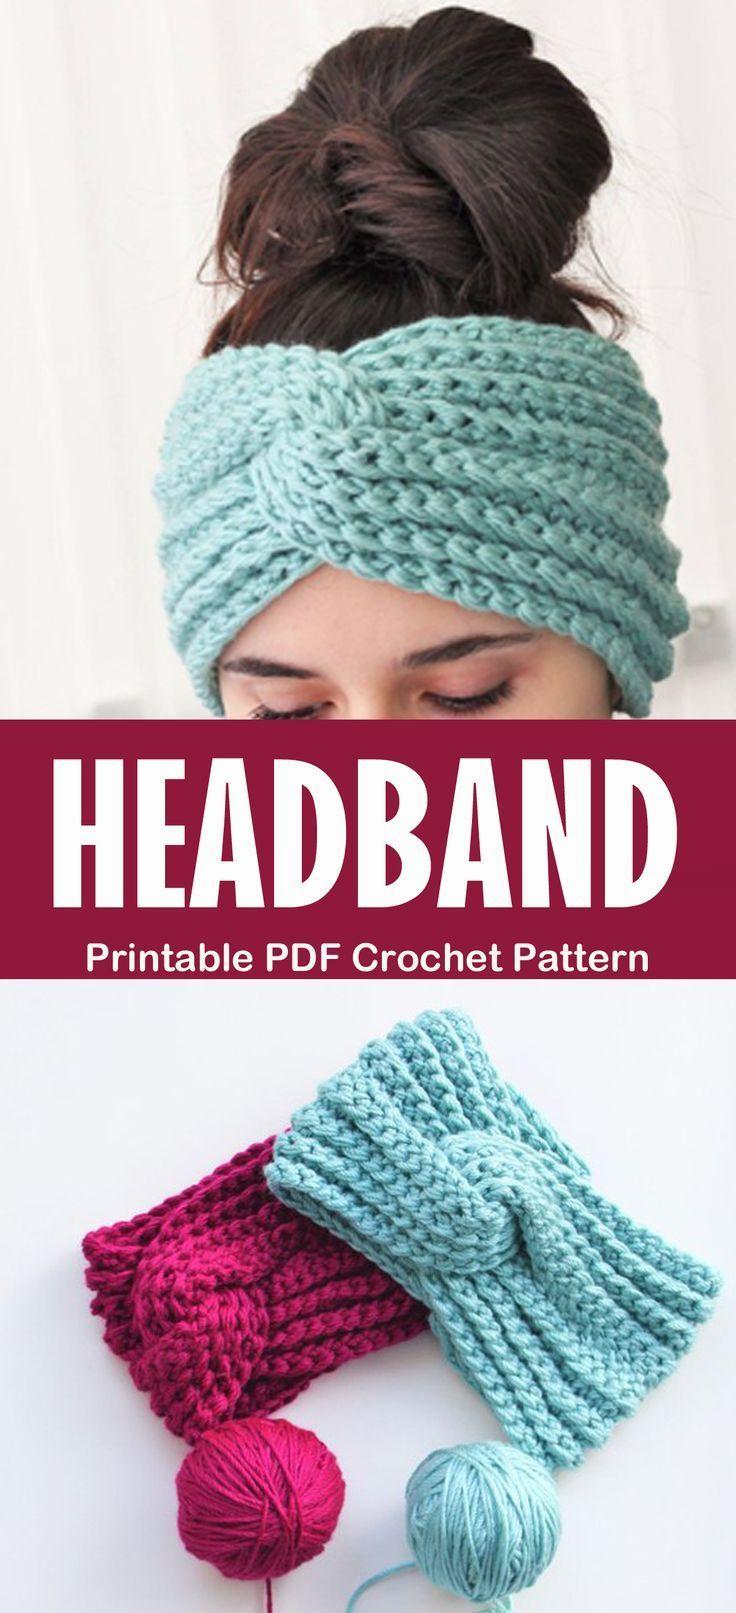 Make a Cozy Headband #babyheadbandtutorial